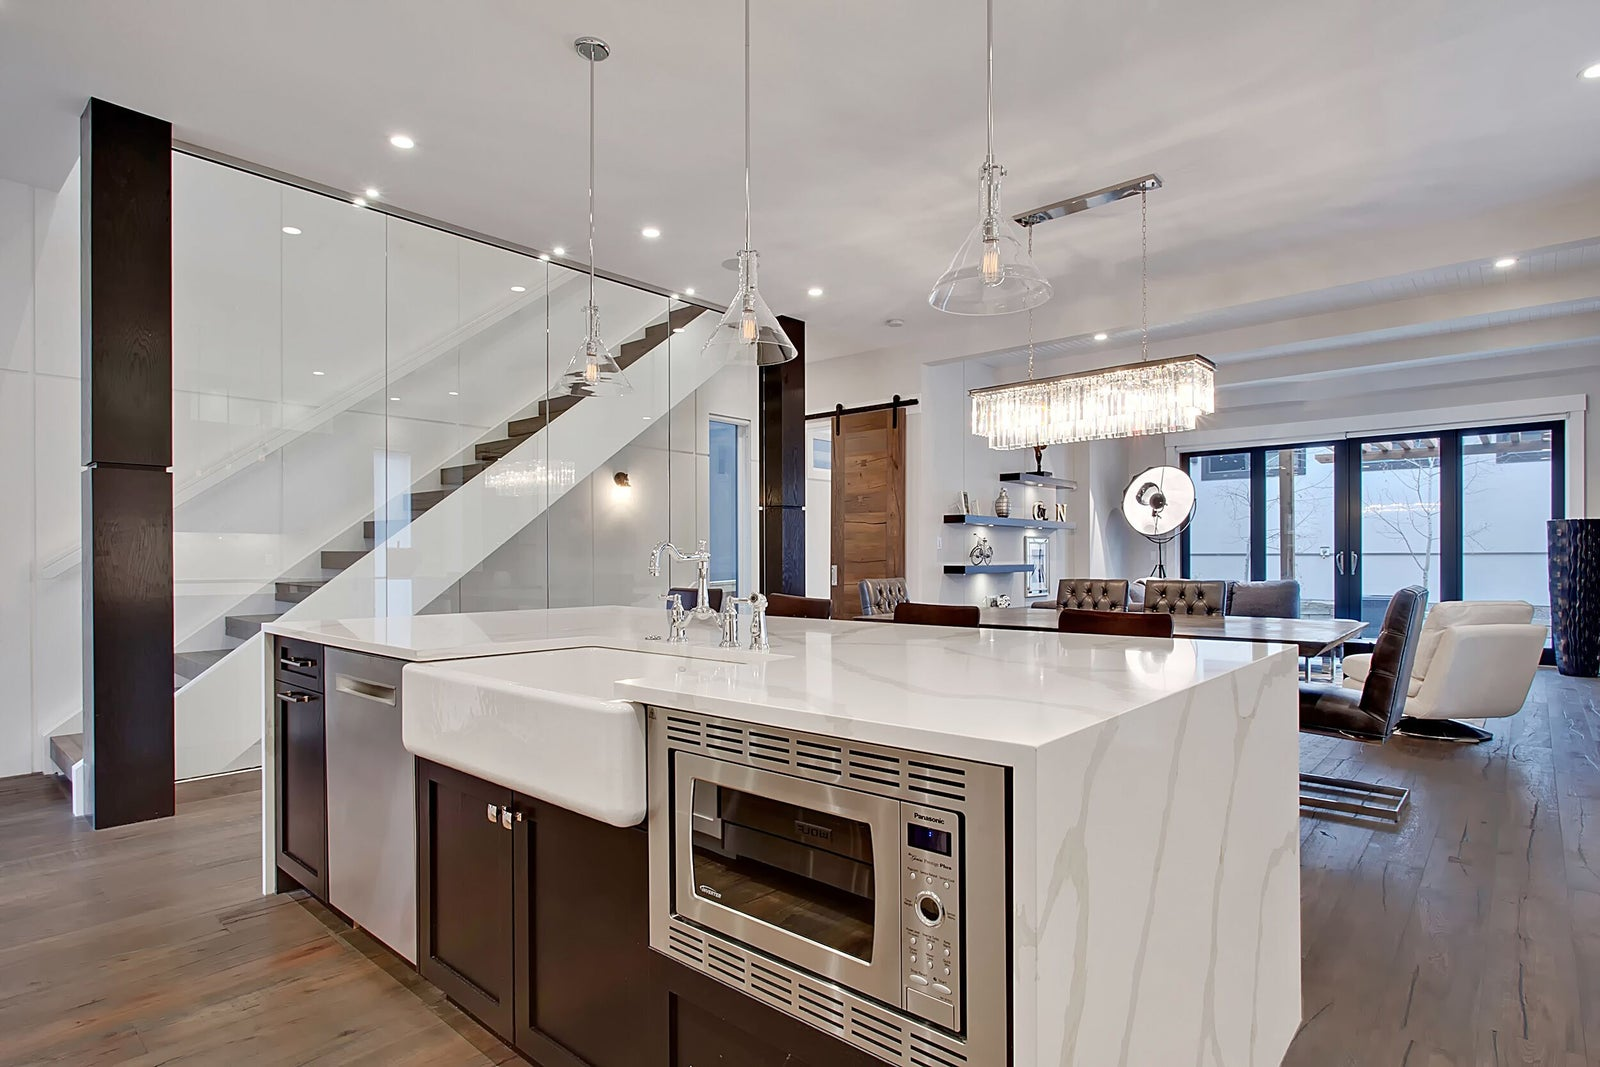 Trung Bien - Realtor Calgary - ReMax Real Estate Central -  House Interior